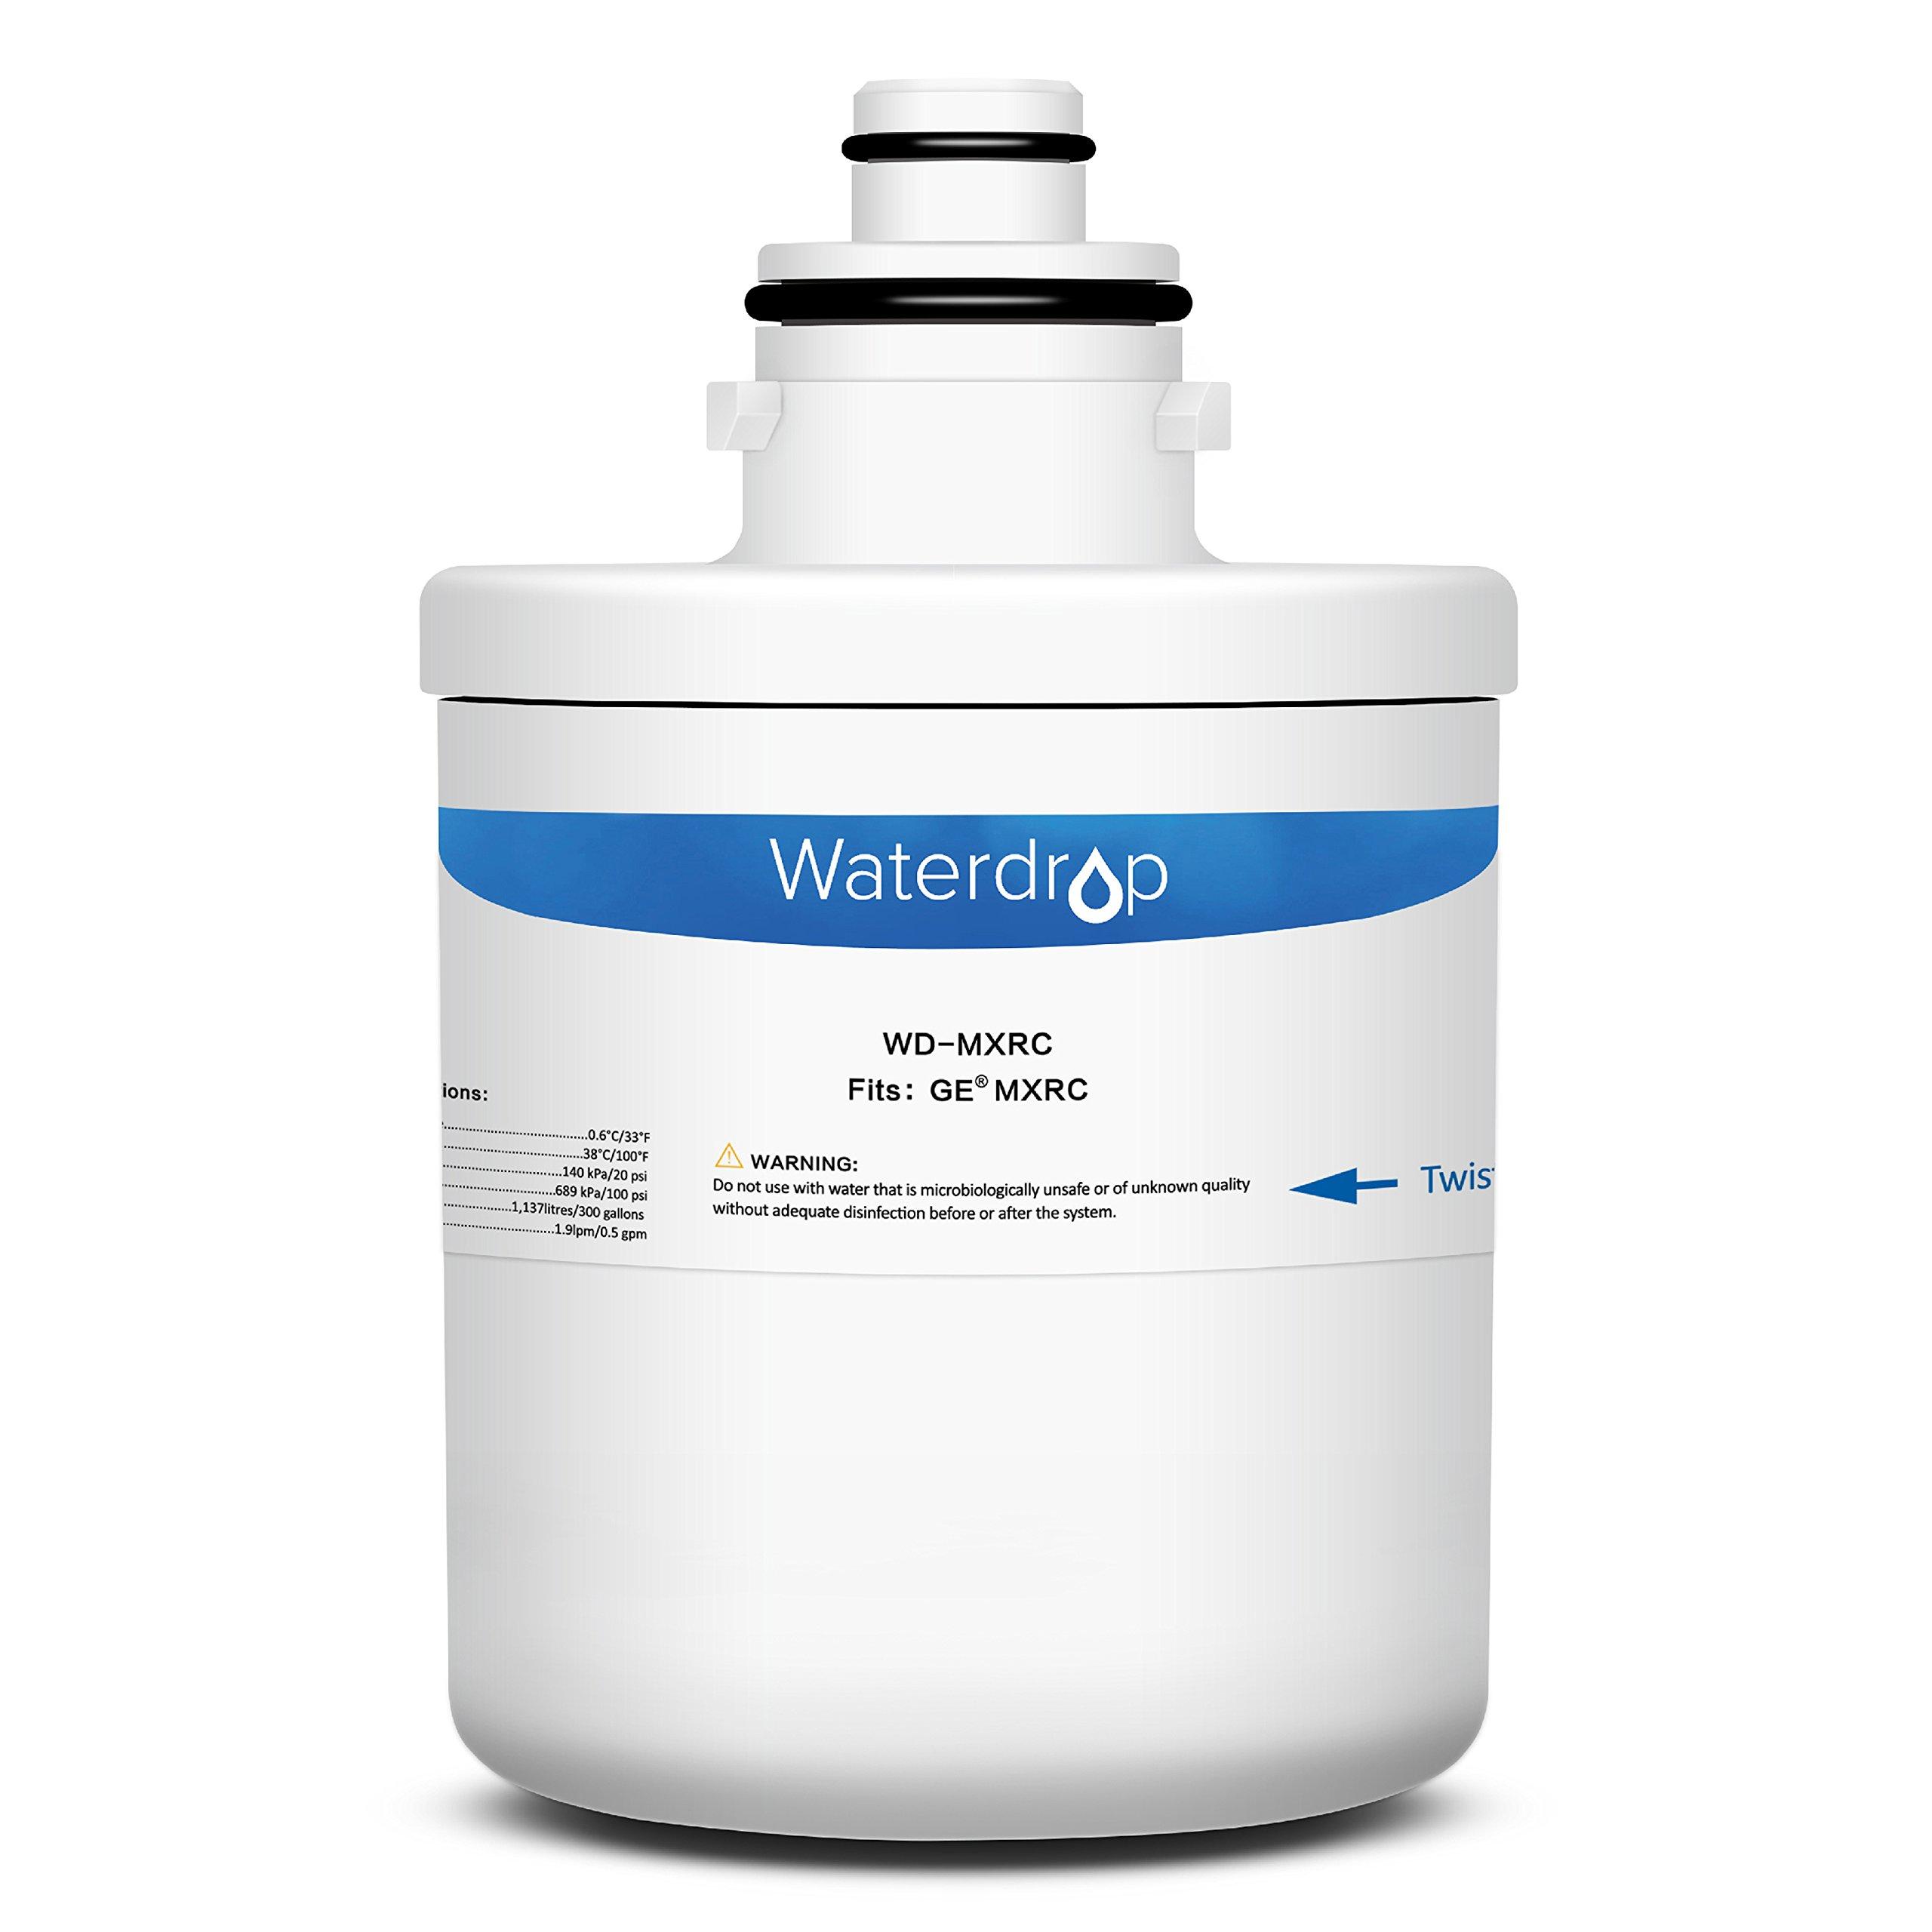 Waterdrop MXRC Replacemnet Refrigerator Water Filter, Compatible with GE MXRC, FXRC, FXRT, HXRC, 9905, 46-9905 & 1E1013